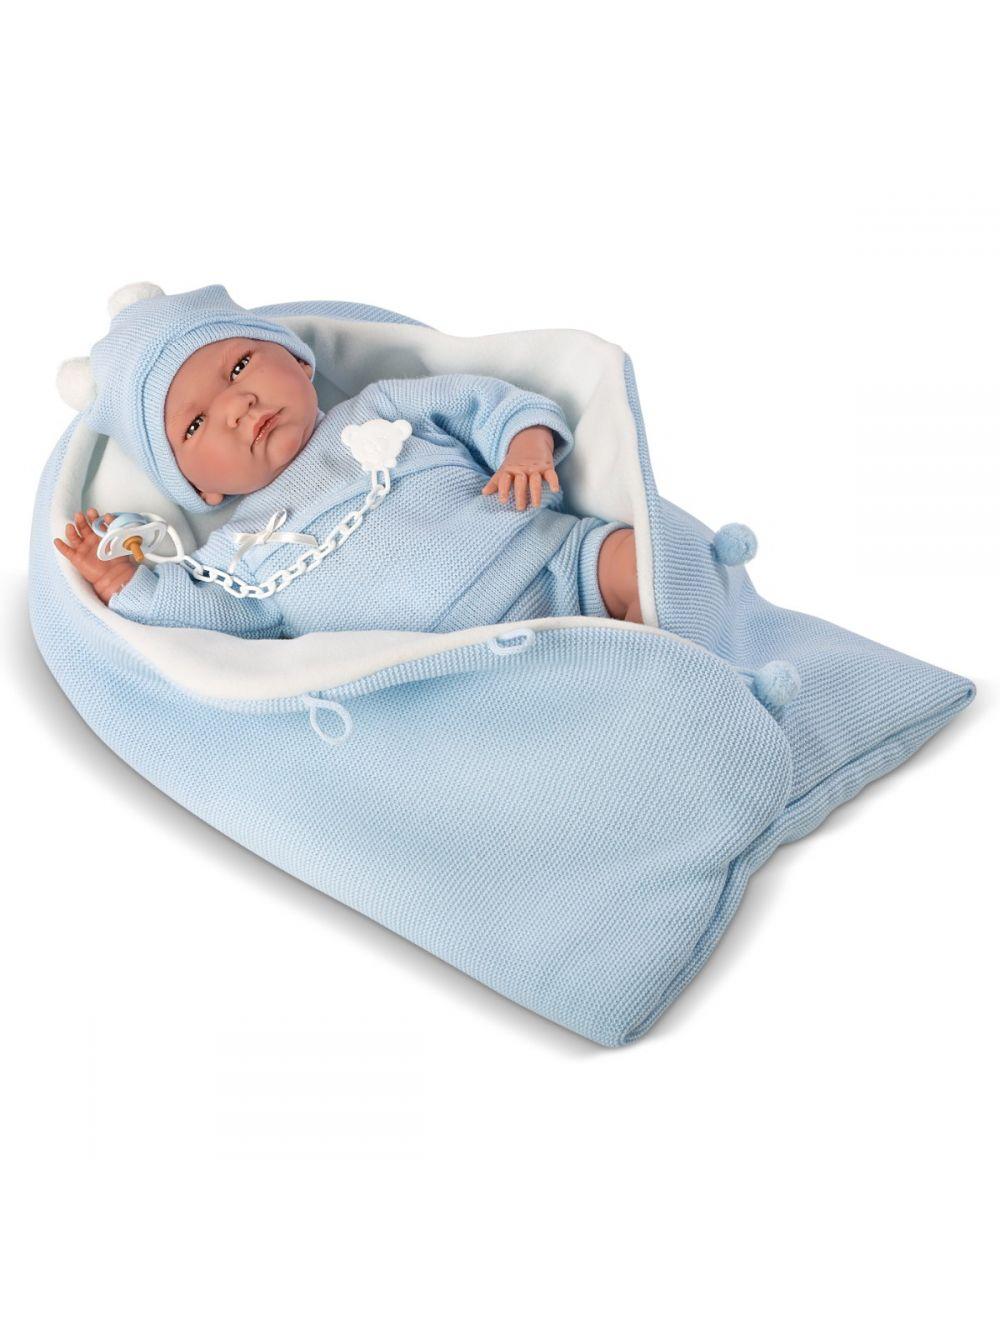 LLORENS Lalka Lalo w niebieskim śpiworku 40 cm